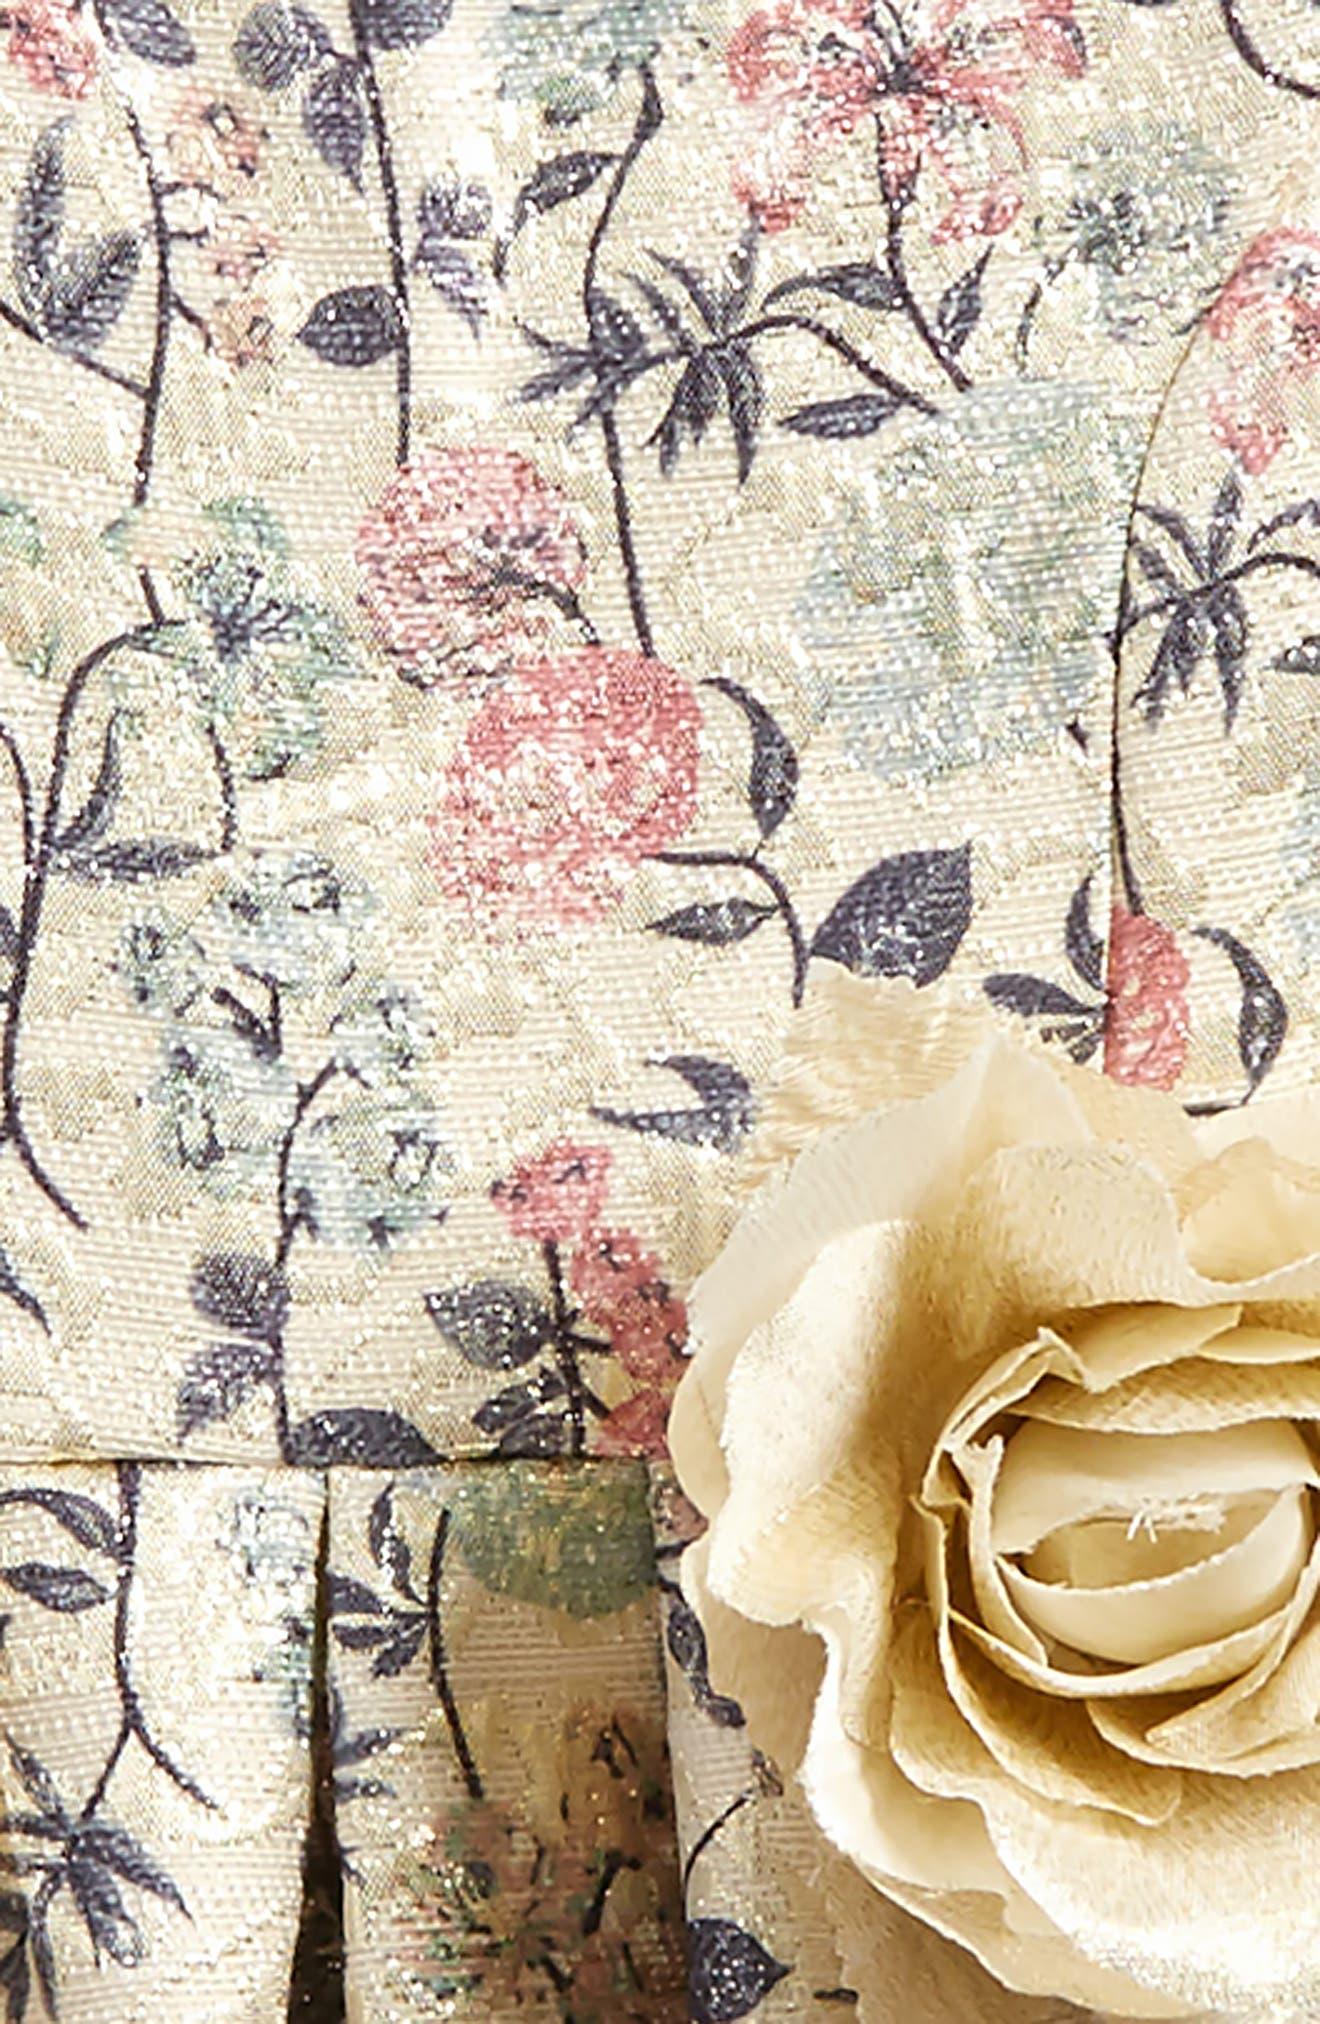 Metallic Floral Brocade Dress,                             Alternate thumbnail 2, color,                             900